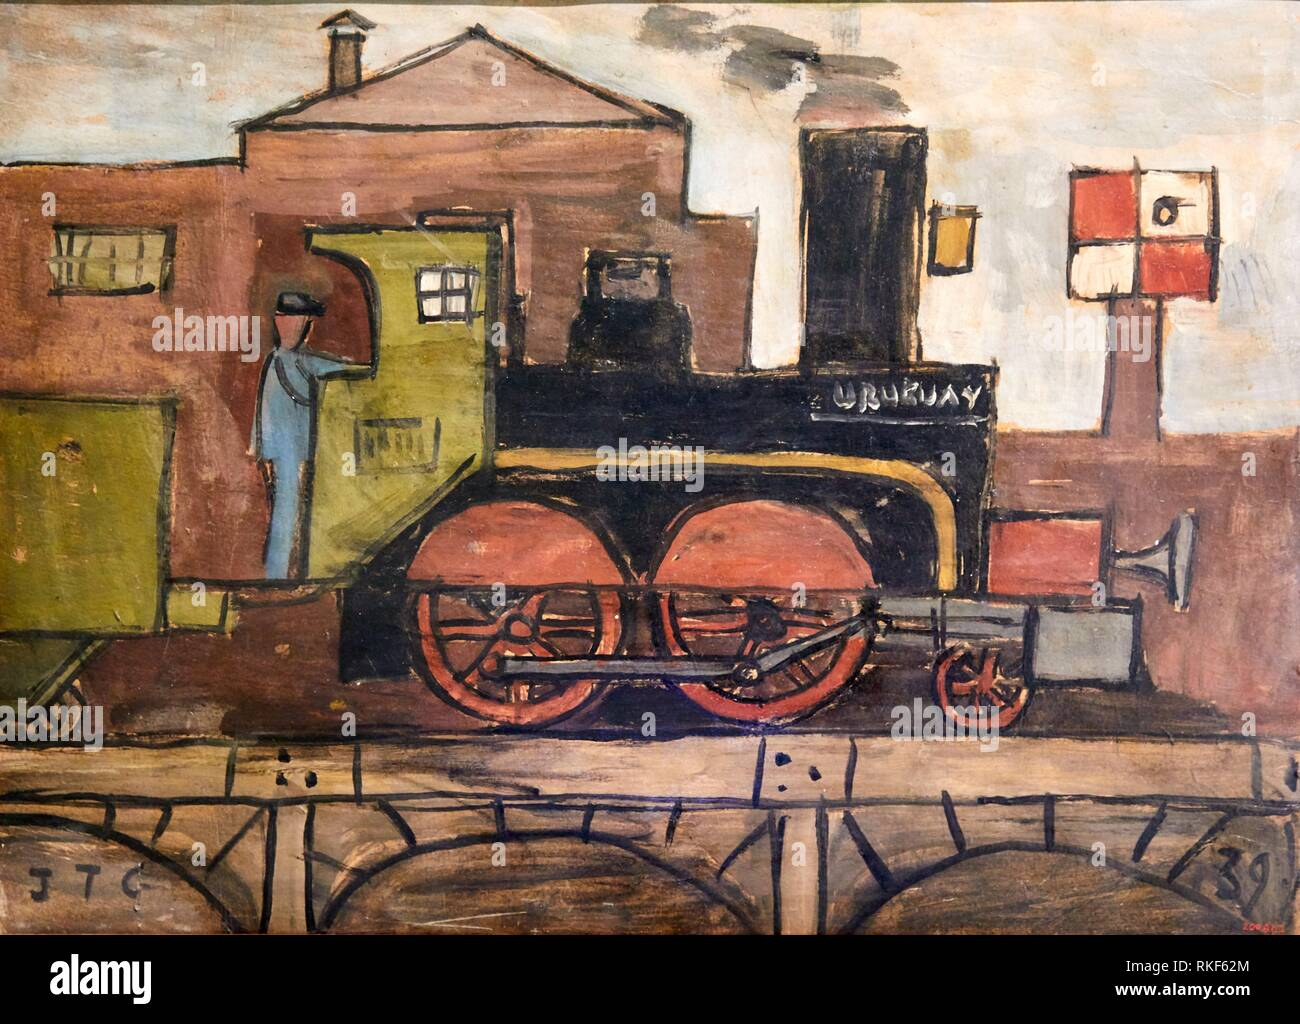 '''Uruguay'', 1939, Joaquim Torres-Garcia, National Museum of Catalan Art, Museu Nacional d Art de Catalunya, MNAC, Barcelona, Spain, Europe - Stock Image